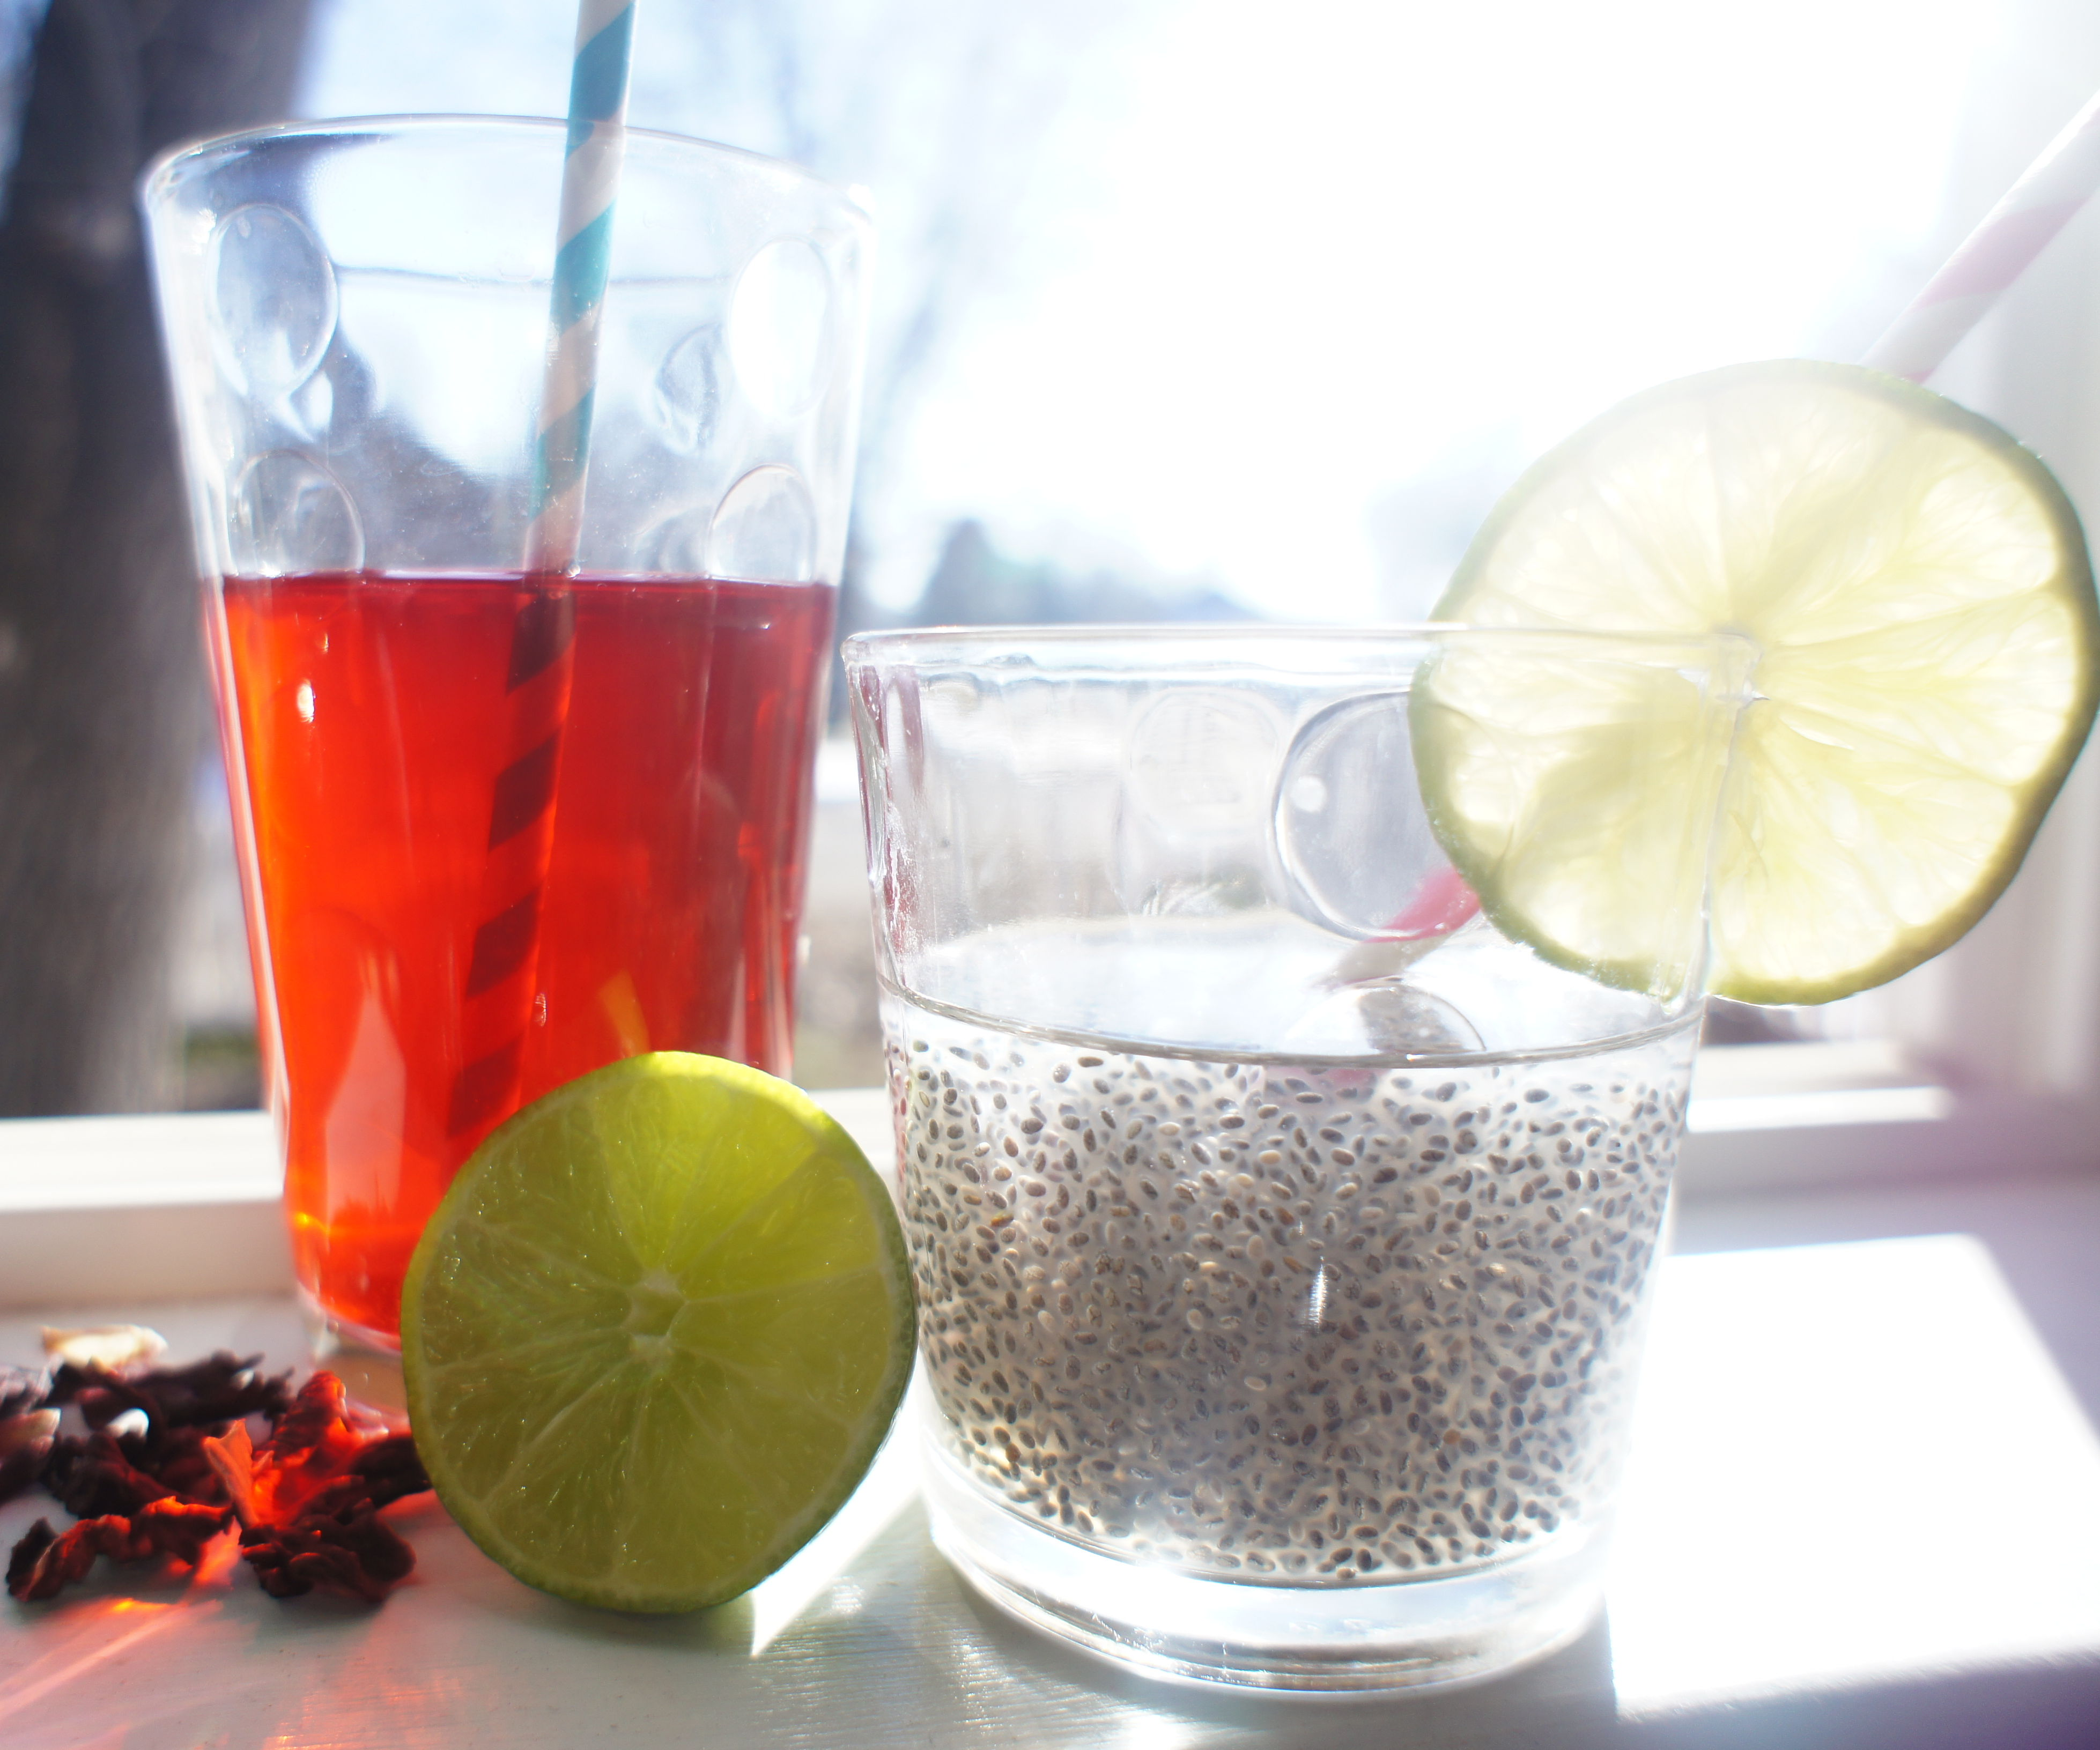 Chia Fresca: Add nutrients to any drink